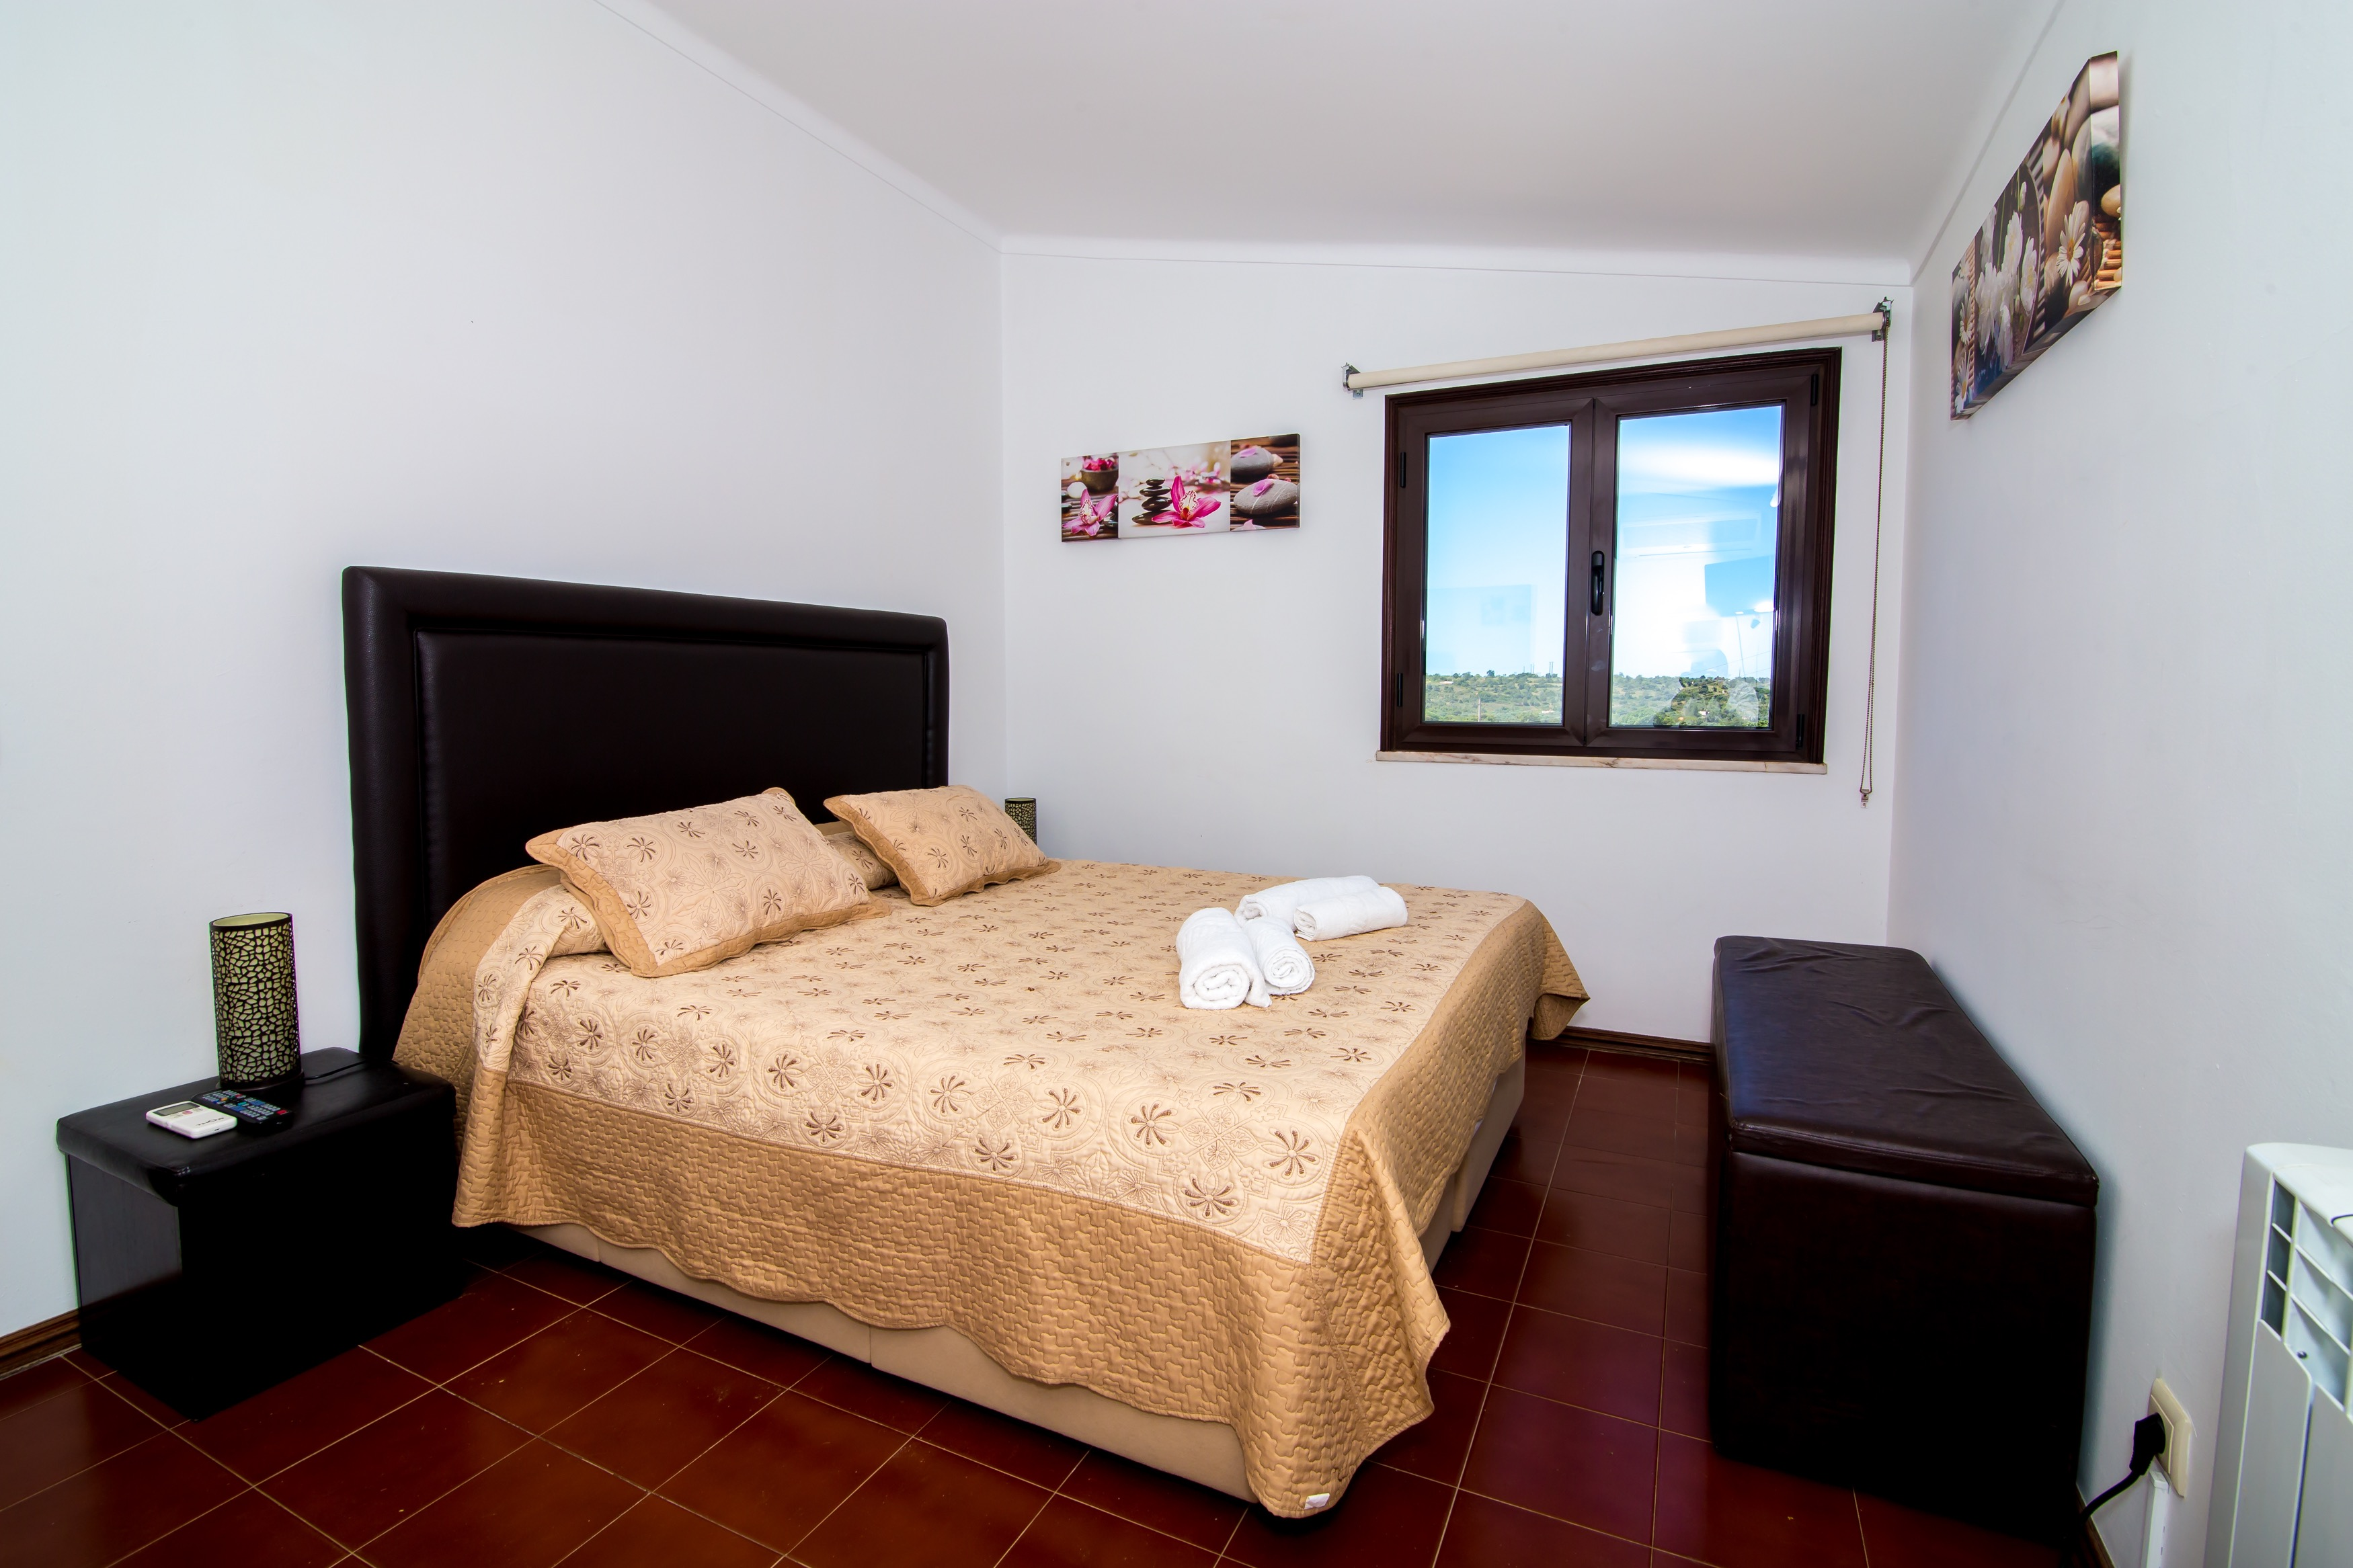 Holiday apartments and villas for rent, Villa Barrancos in Guia, Portugal Algarve, REF_IMG_5770_5781